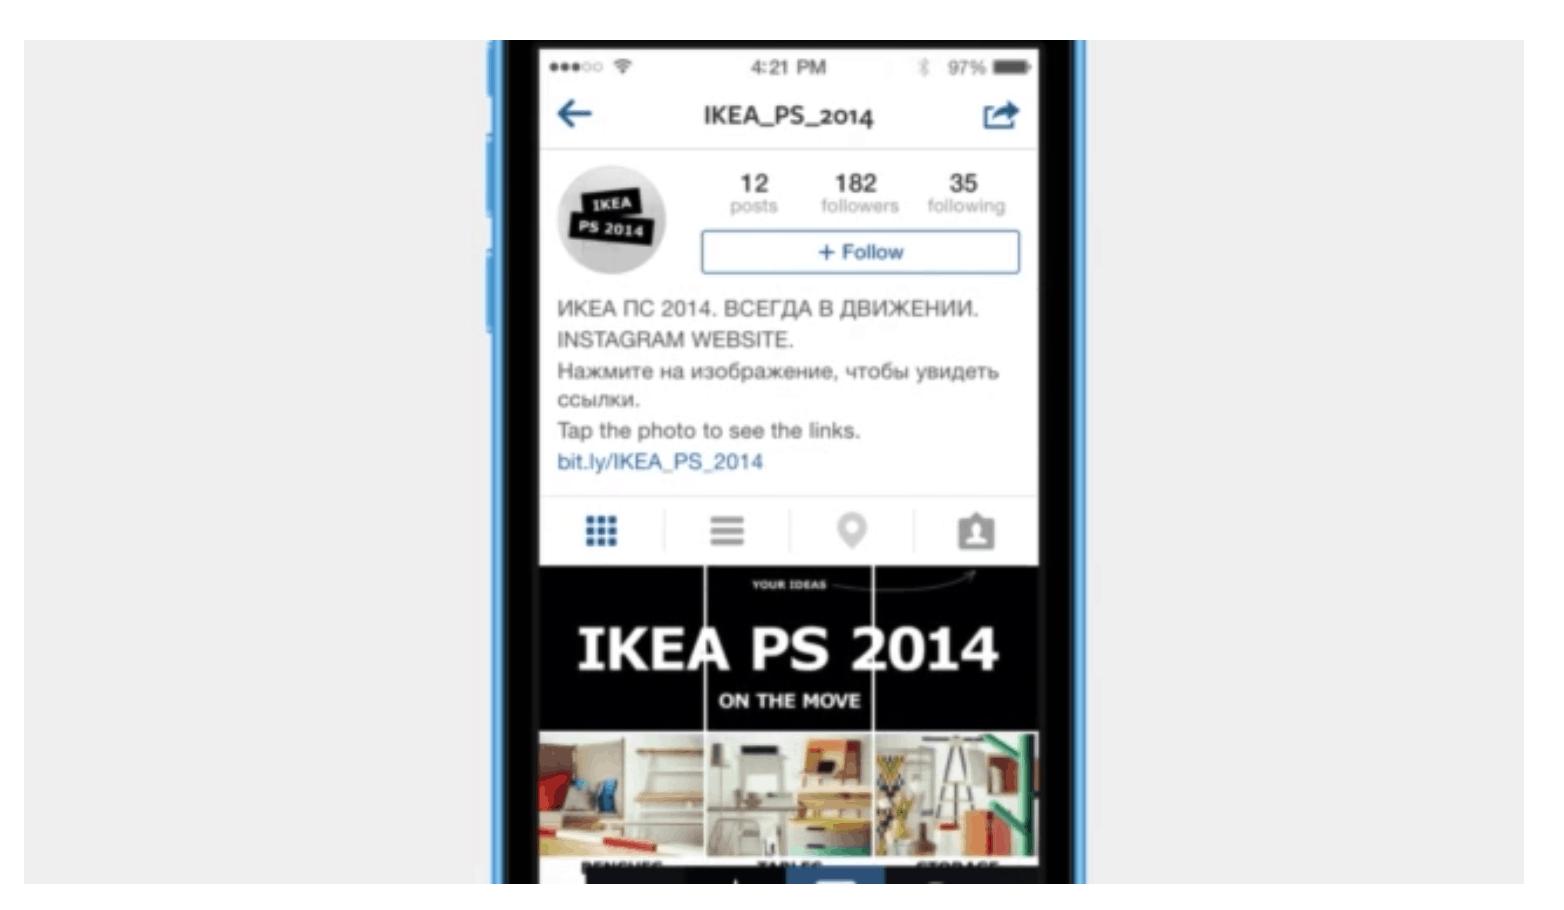 IKEA PS Instagram profile